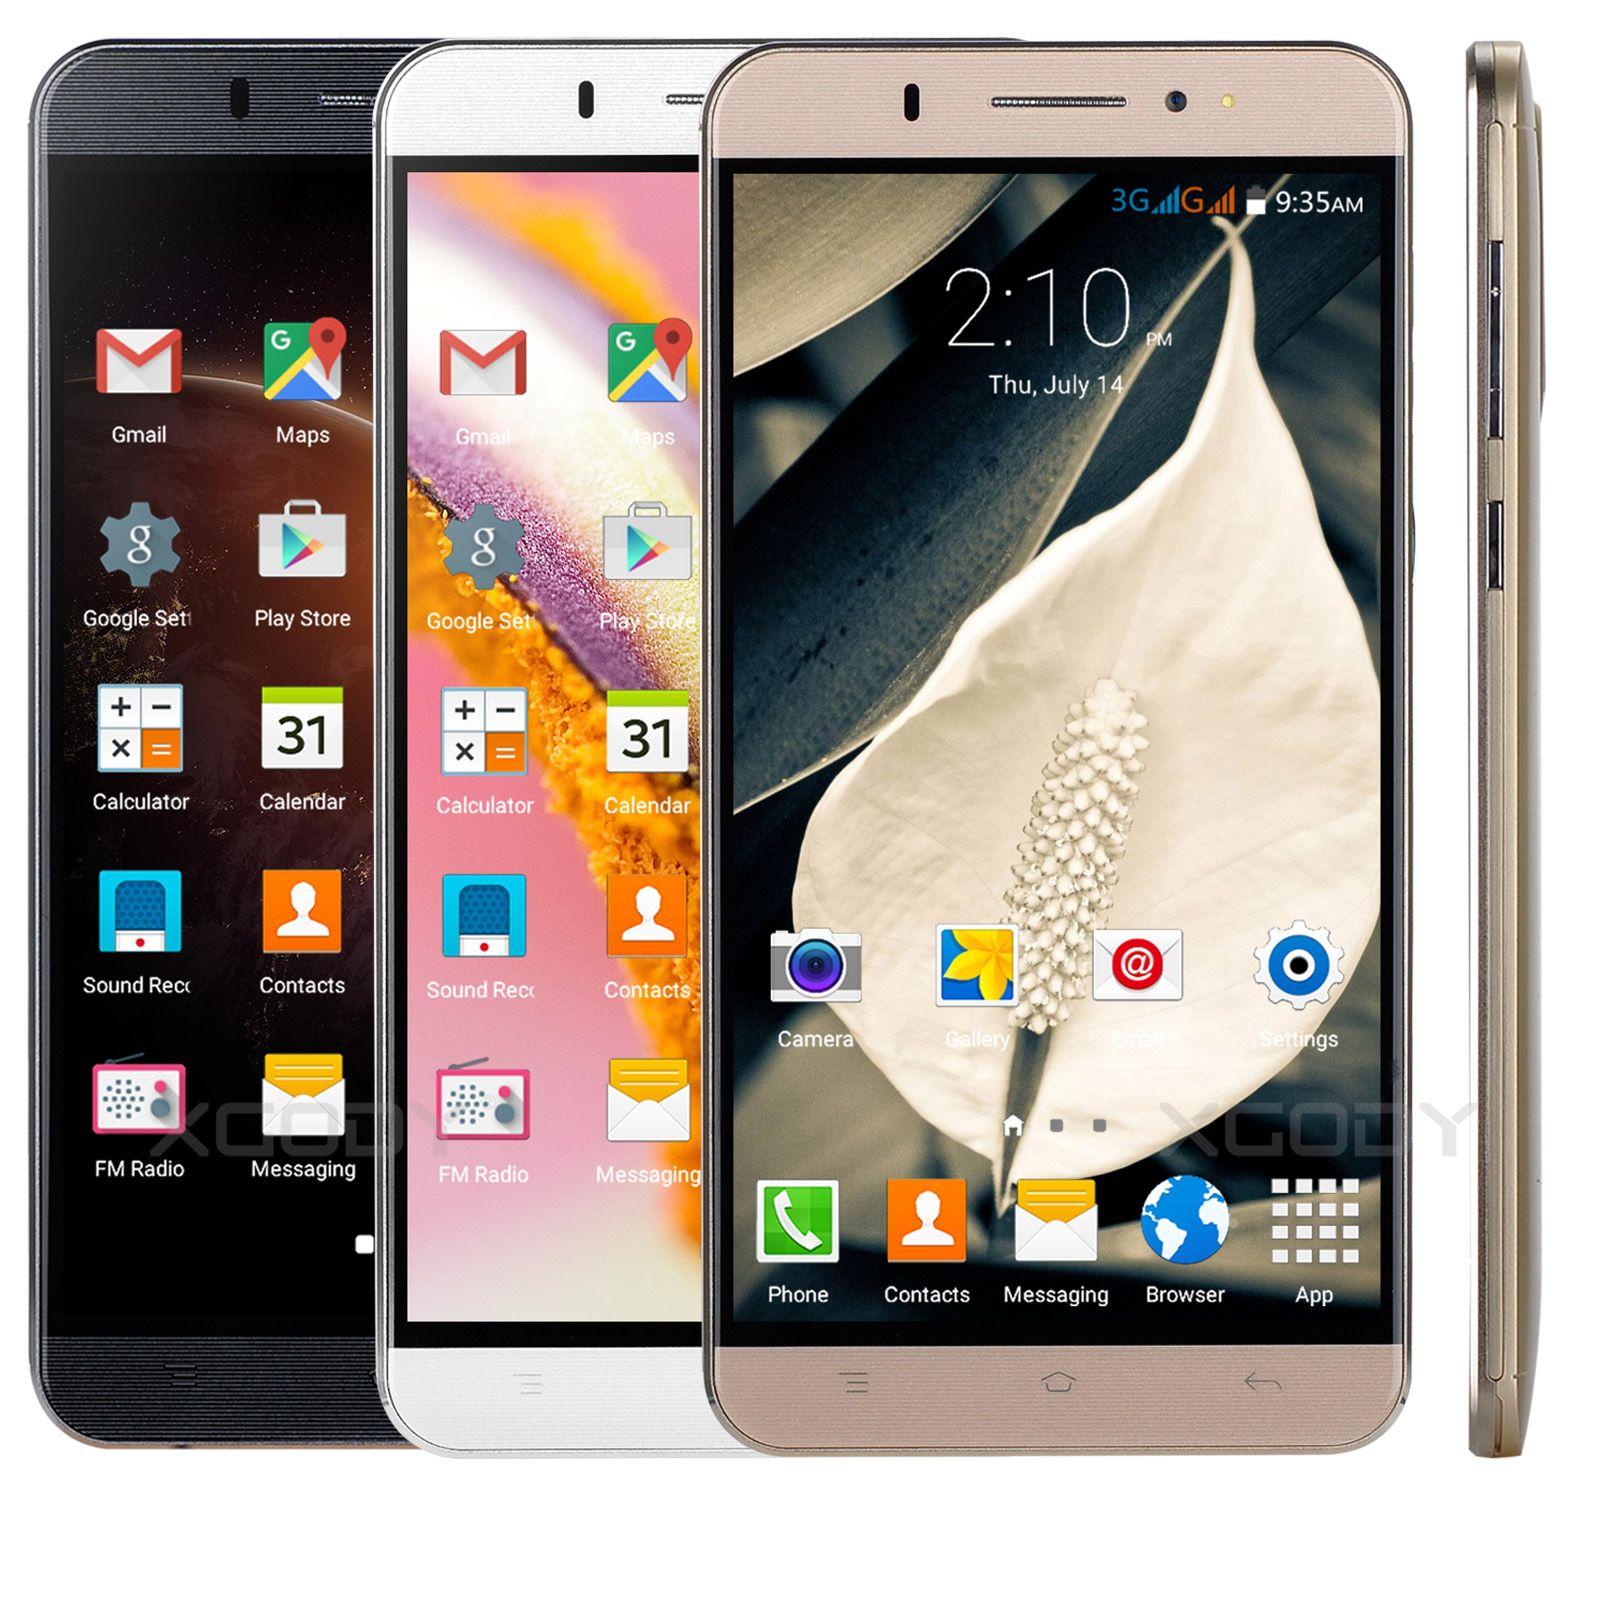 Xgody Y20 6 Inch Android 5.1 Unlocked Smartphones Quad